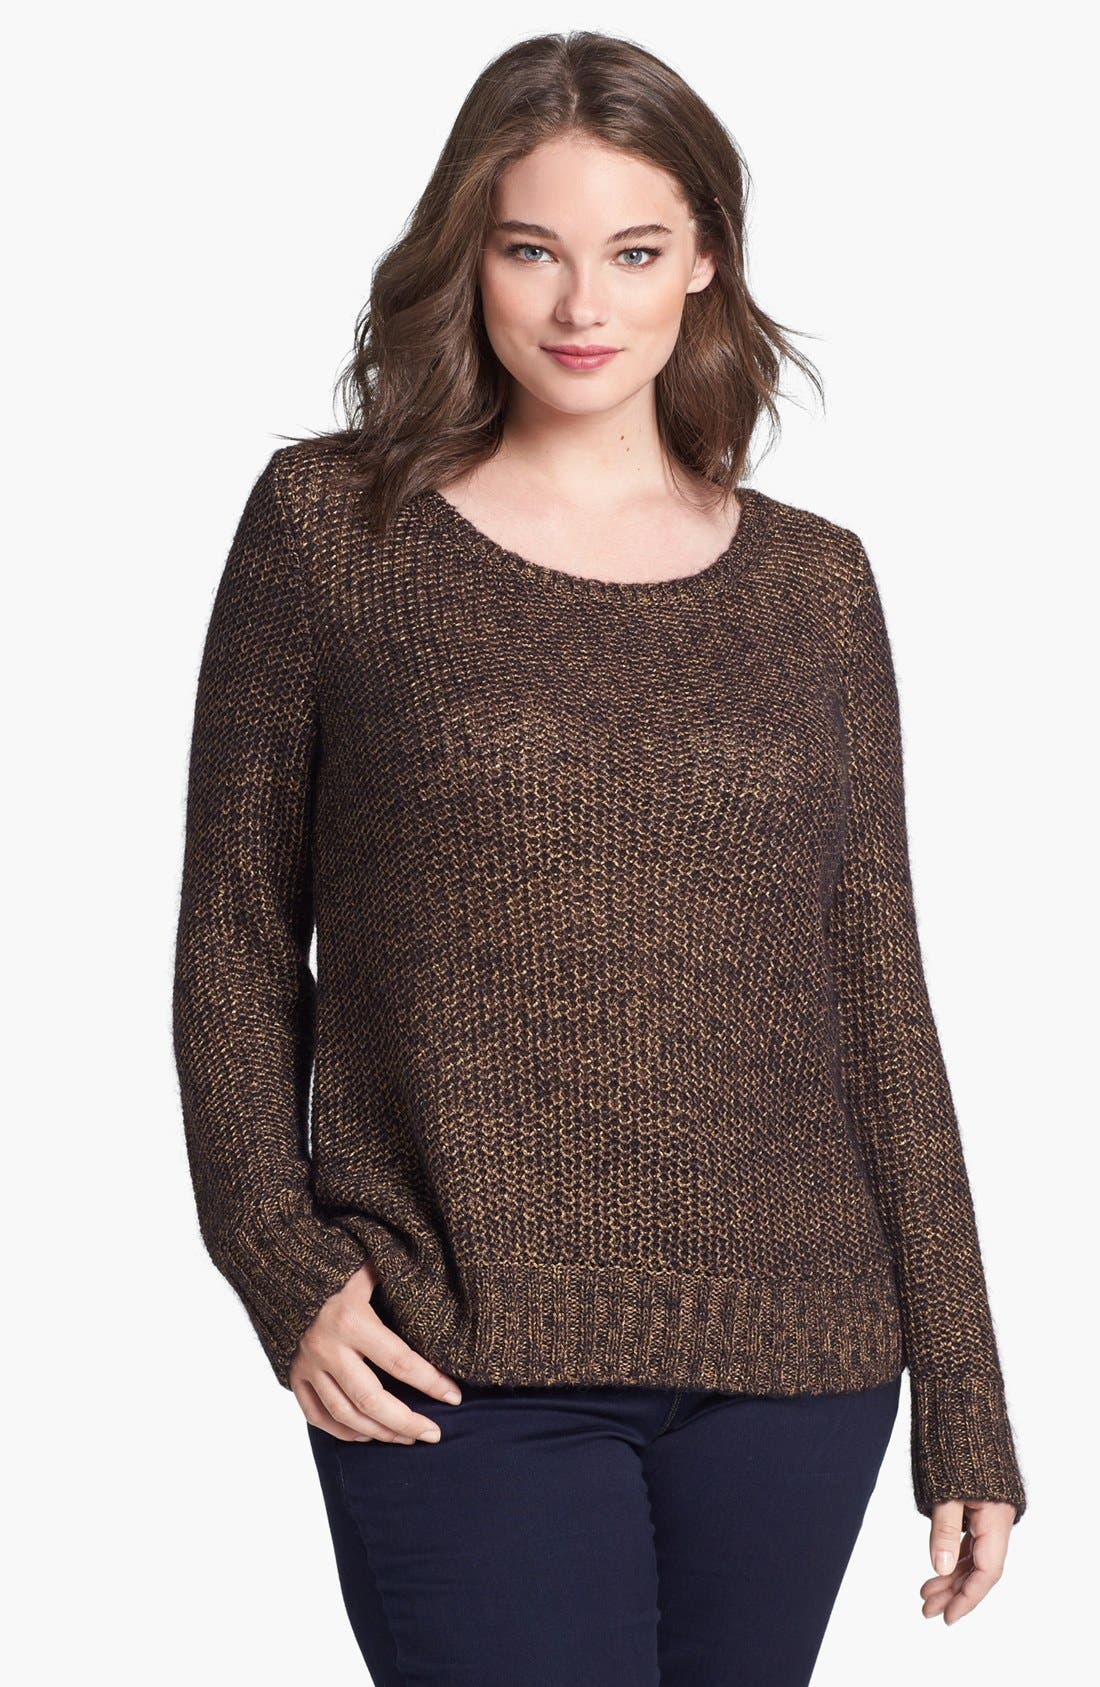 Alternate Image 1 Selected - Eileen Fisher Metallic Sweater (Plus Size)